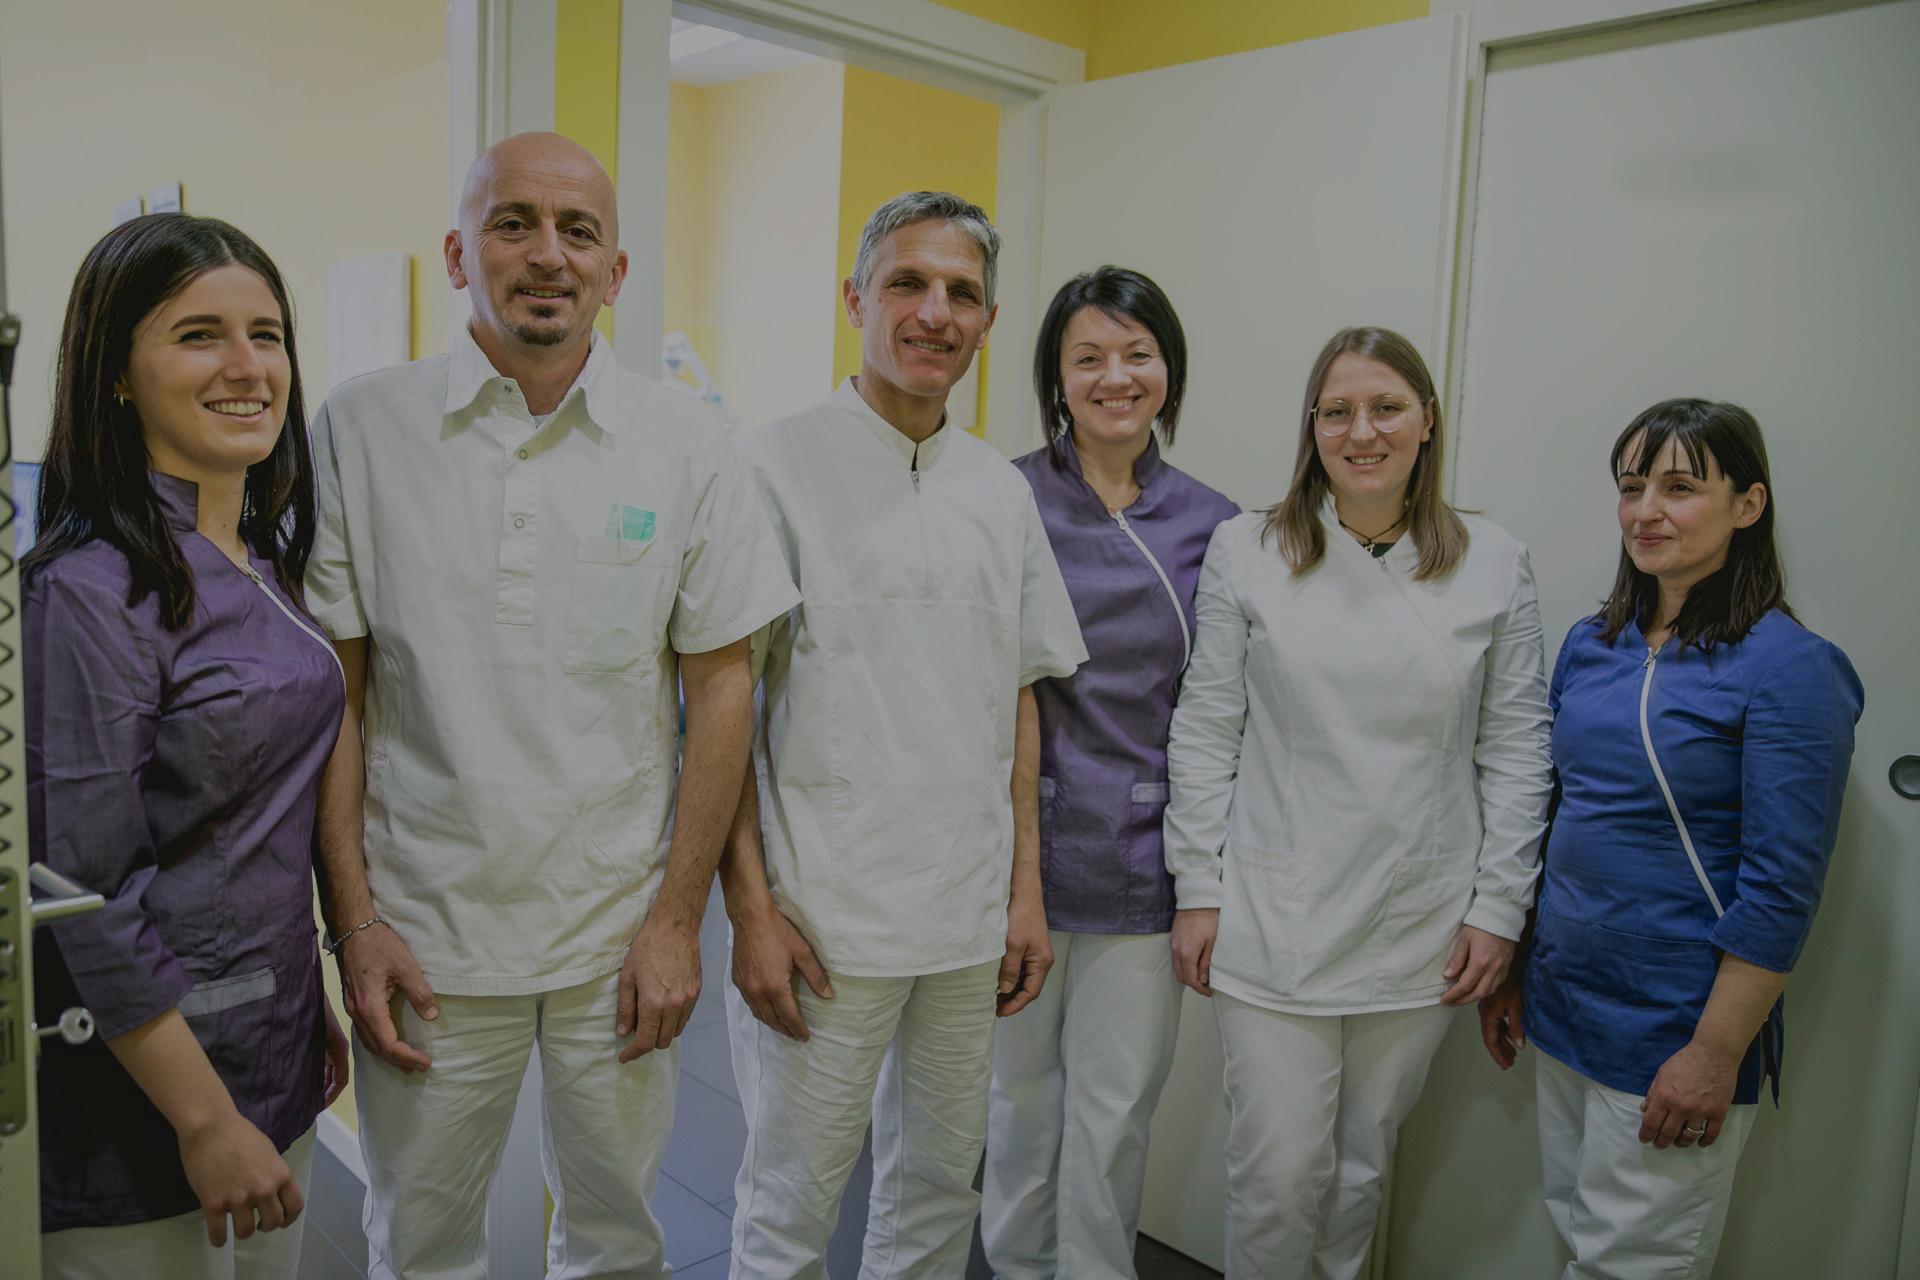 Centro Odontoiatrico OS Forlì professionisti salute dentale